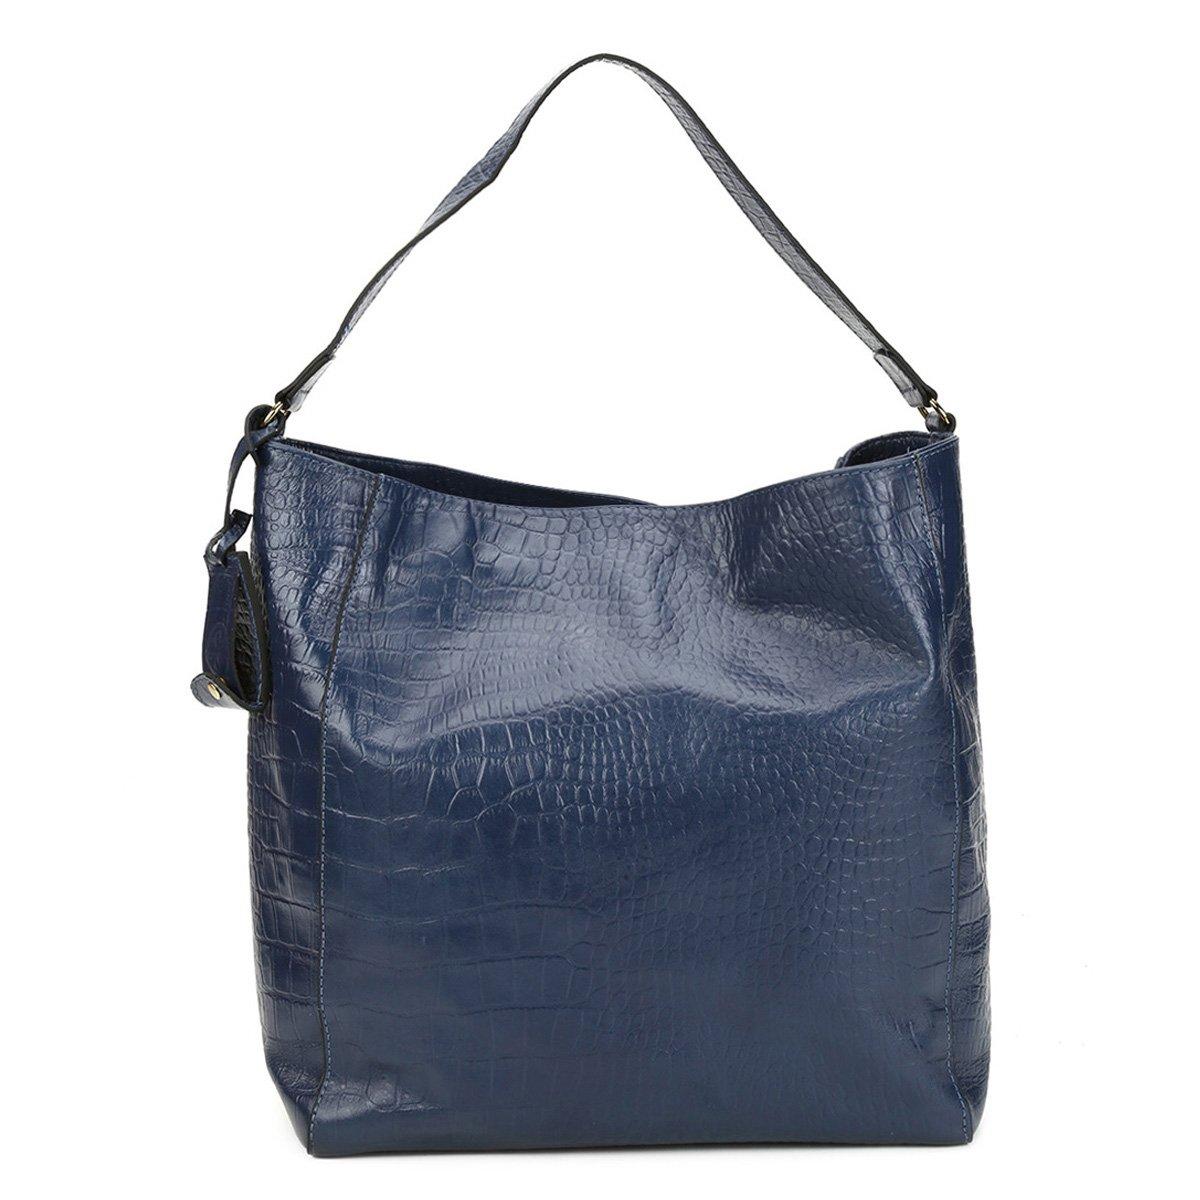 26d2d9230 Bolsa Couro Shoestock Hobo Alça Dupla Croco Feminina - Compre Agora ...